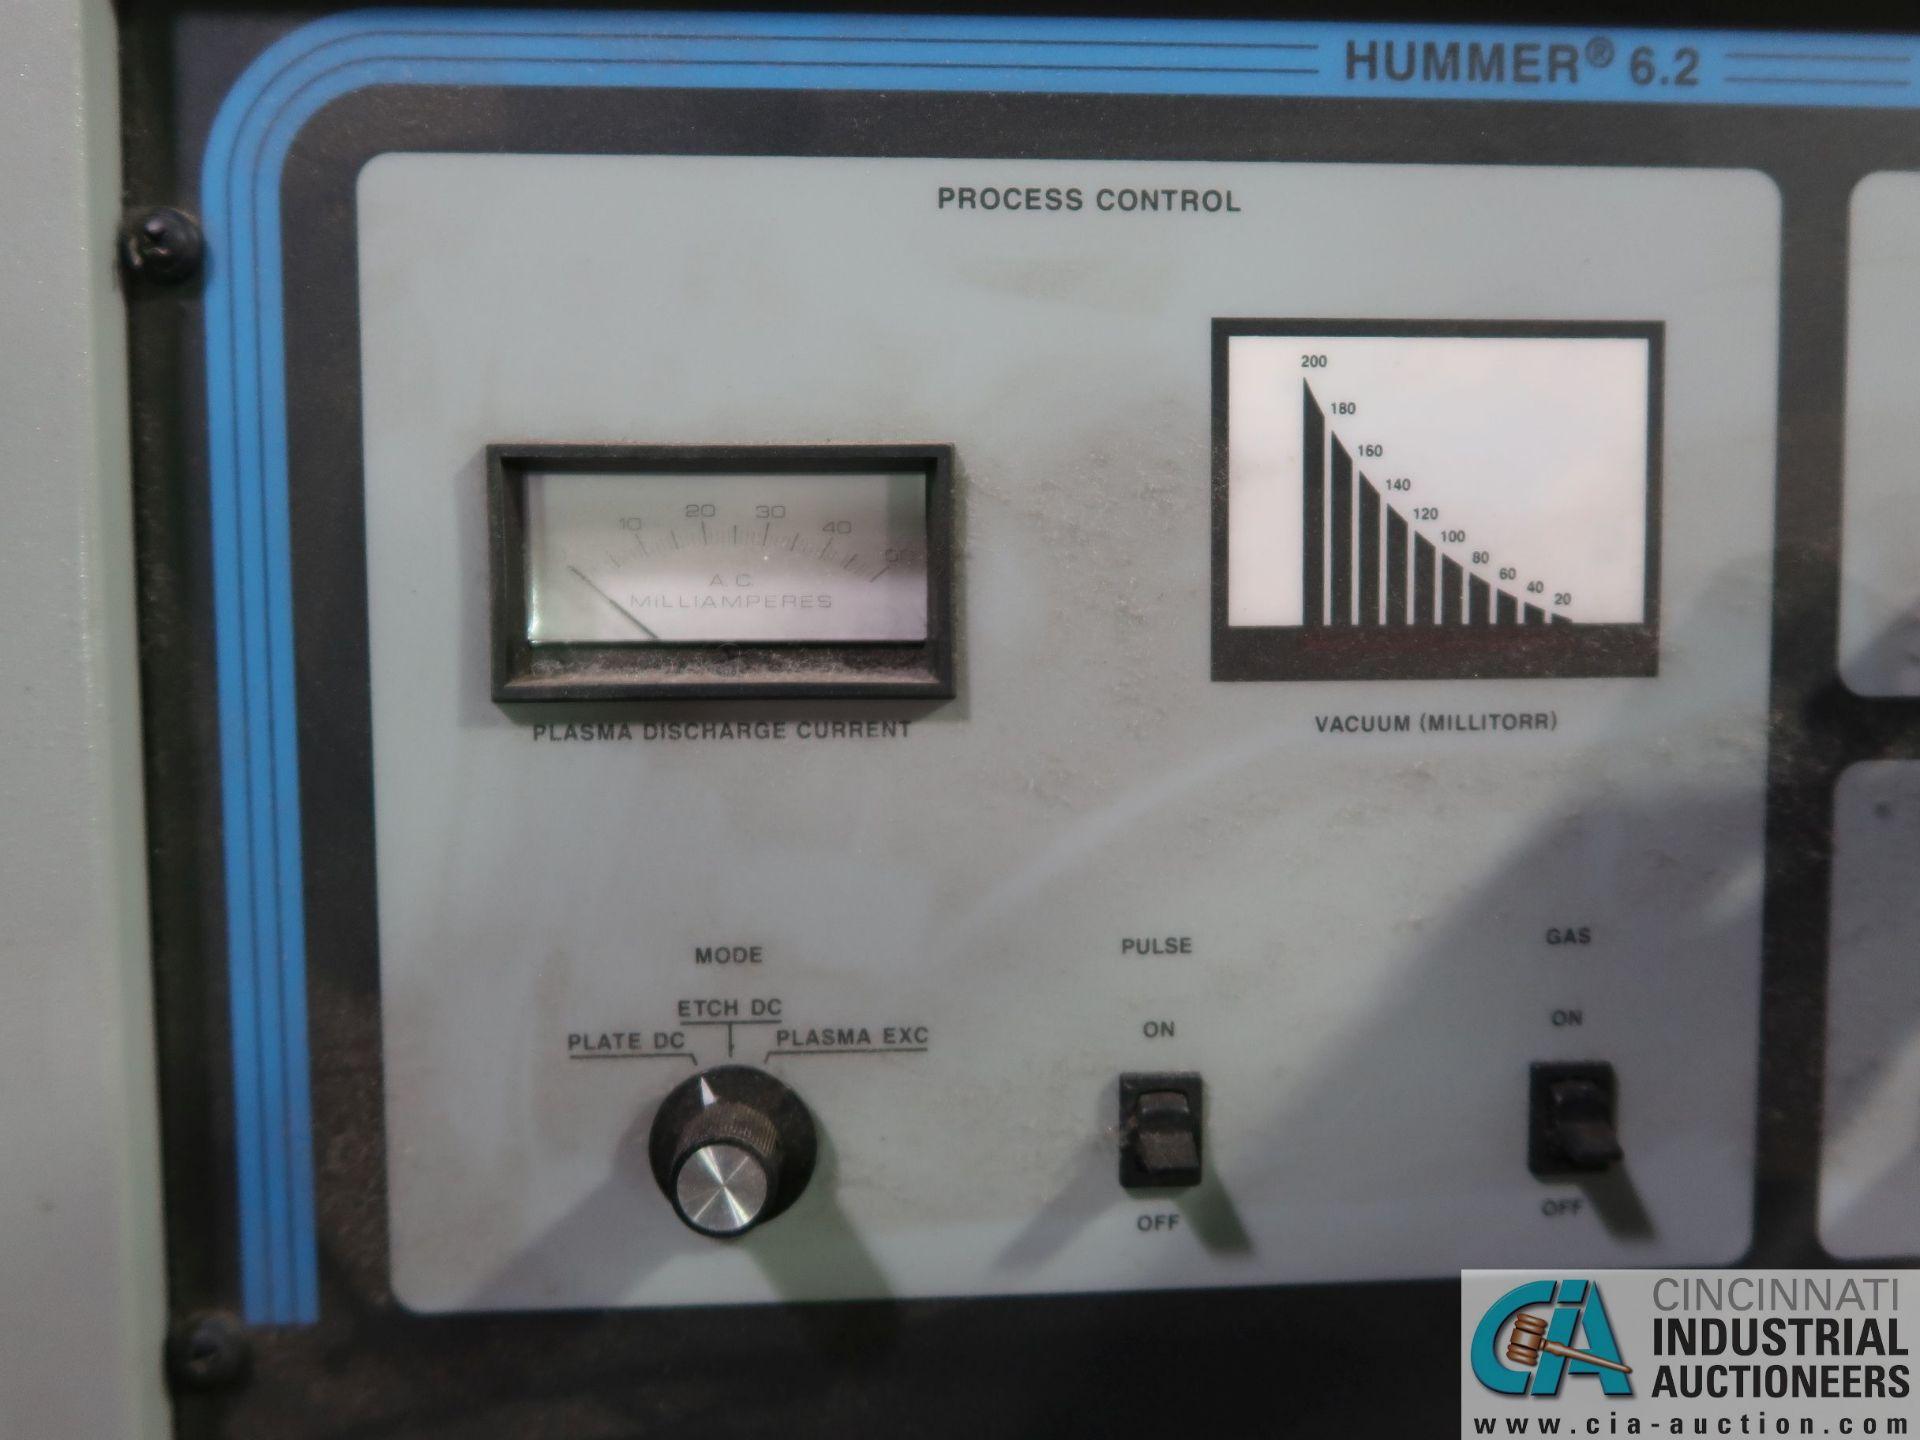 Lot 53 - ANATECH MODEL HUMMER 6.2+B62 SPUTTER COATING MACHINE; S/N 1021121